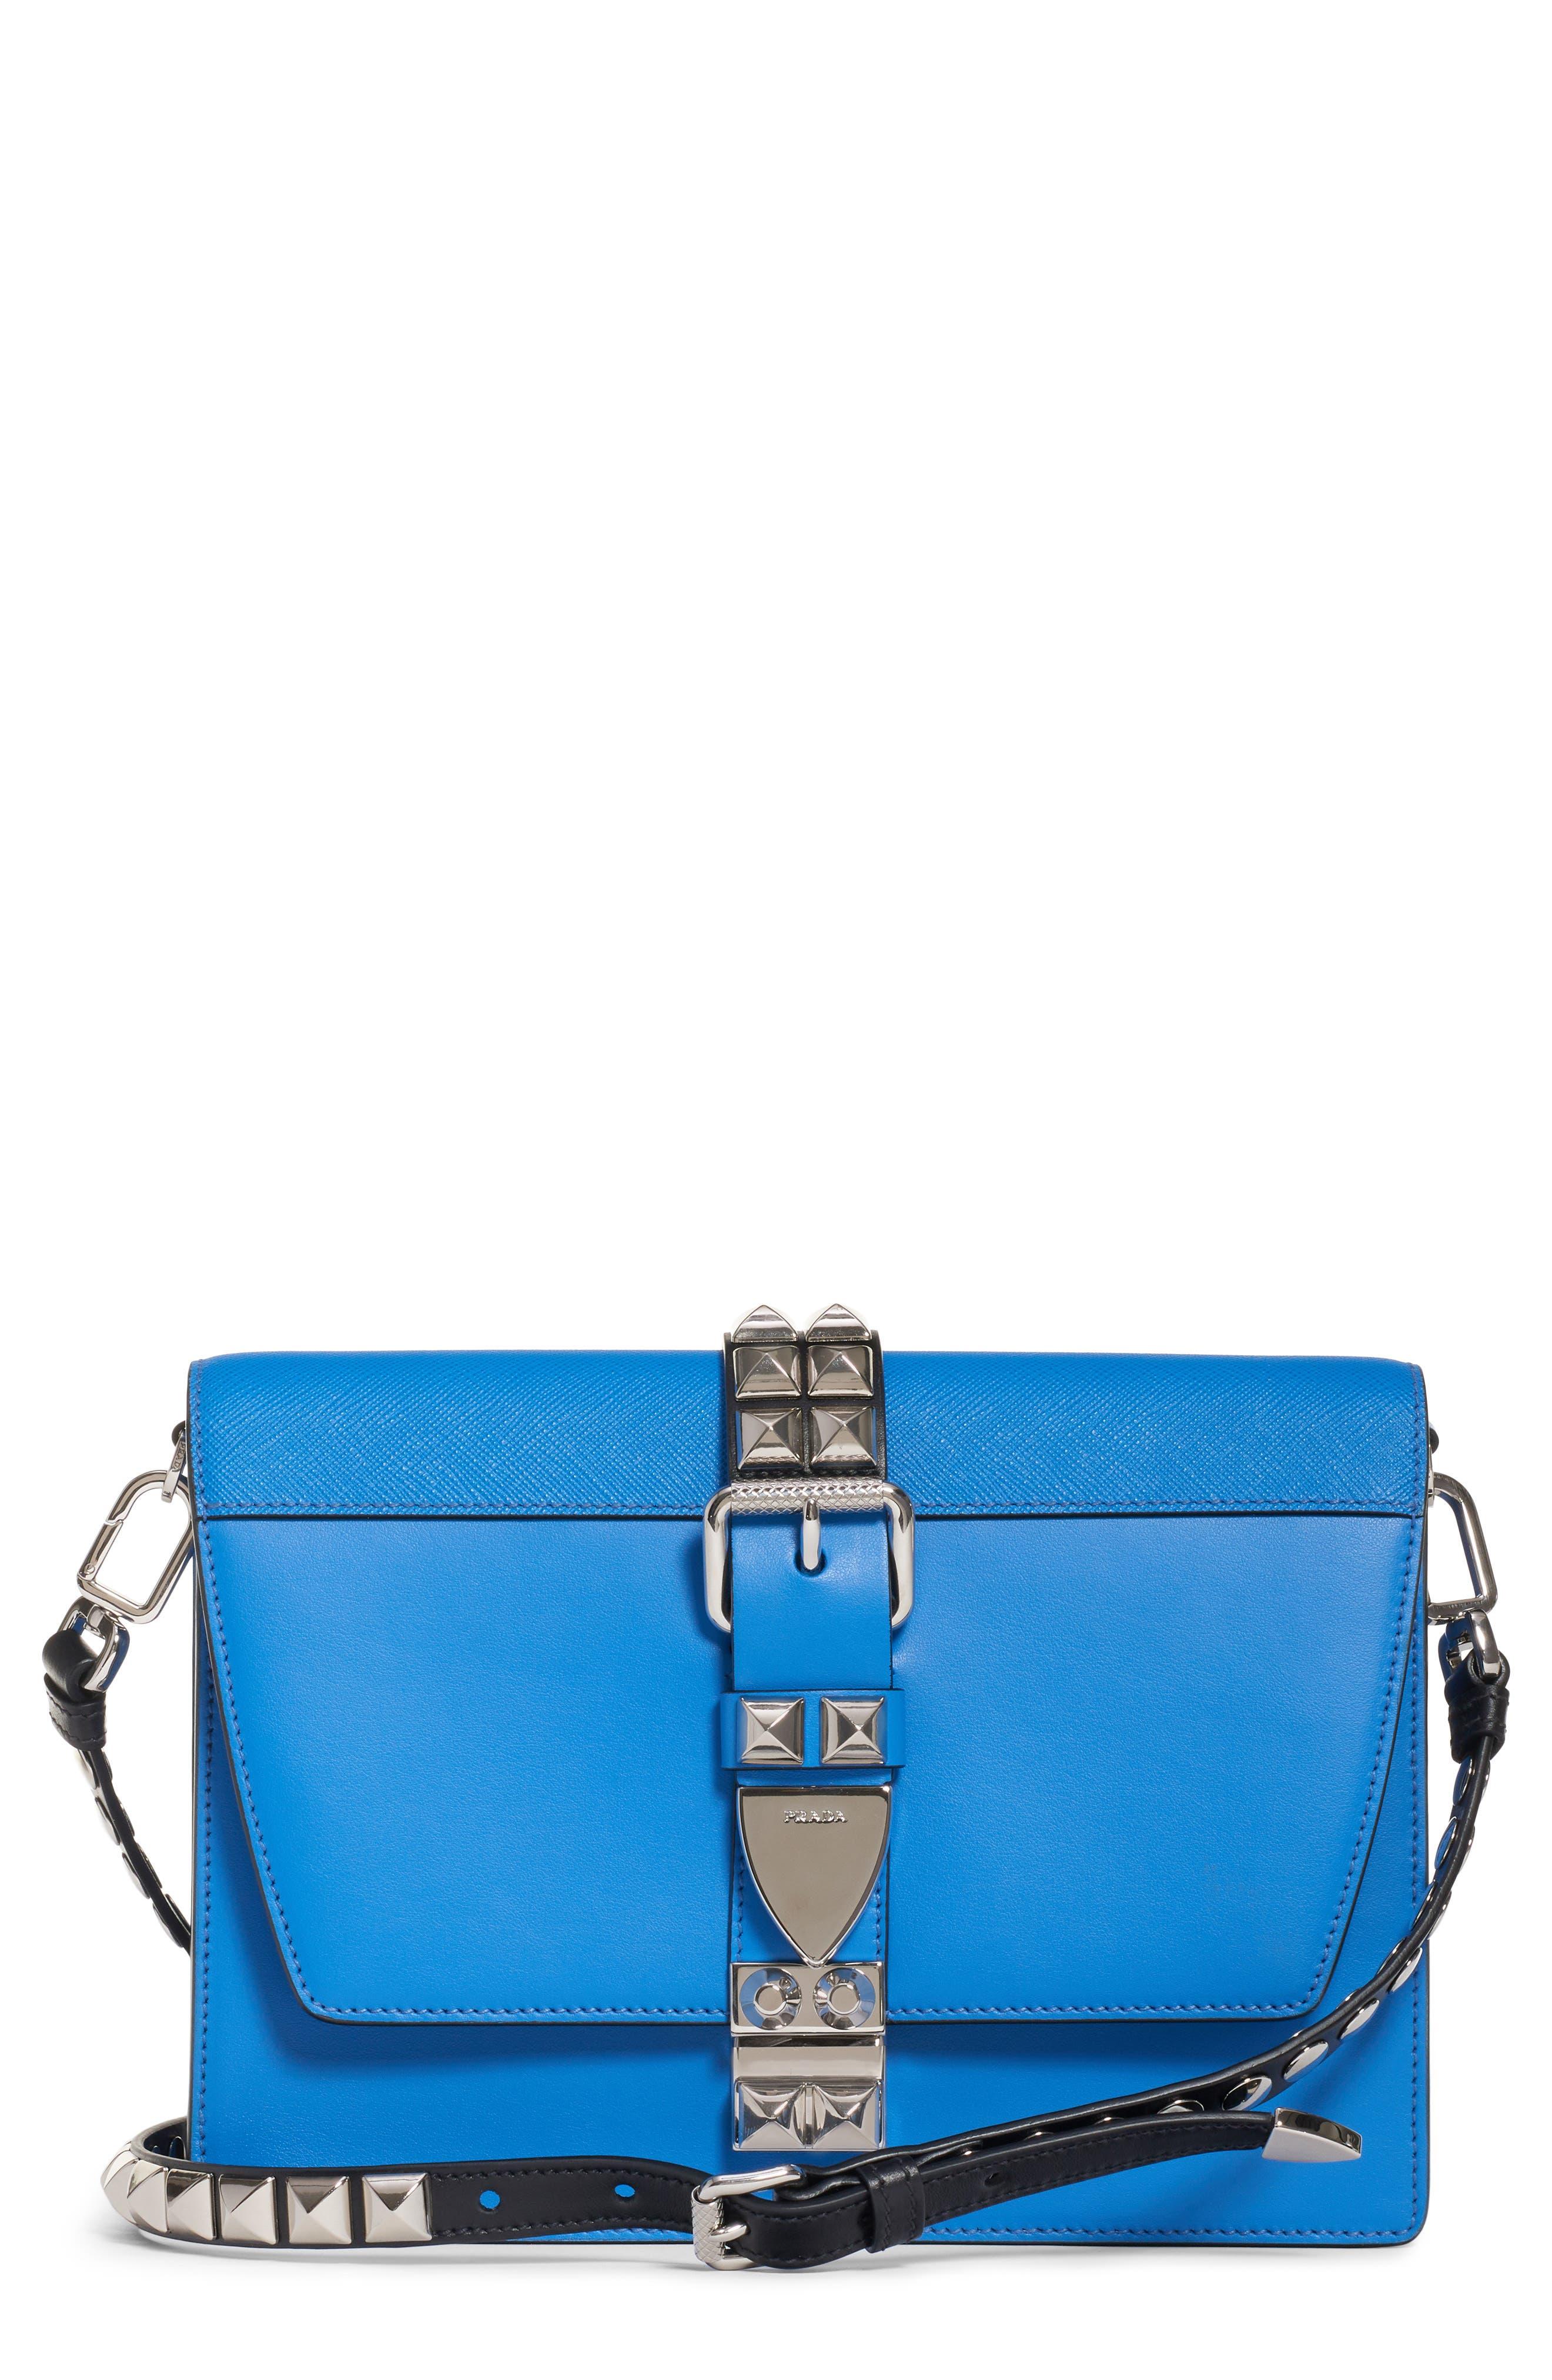 b9e0b35ebb6d ... official prada elektra medium studded calfskin leather crossbody bag  a092b 23a99